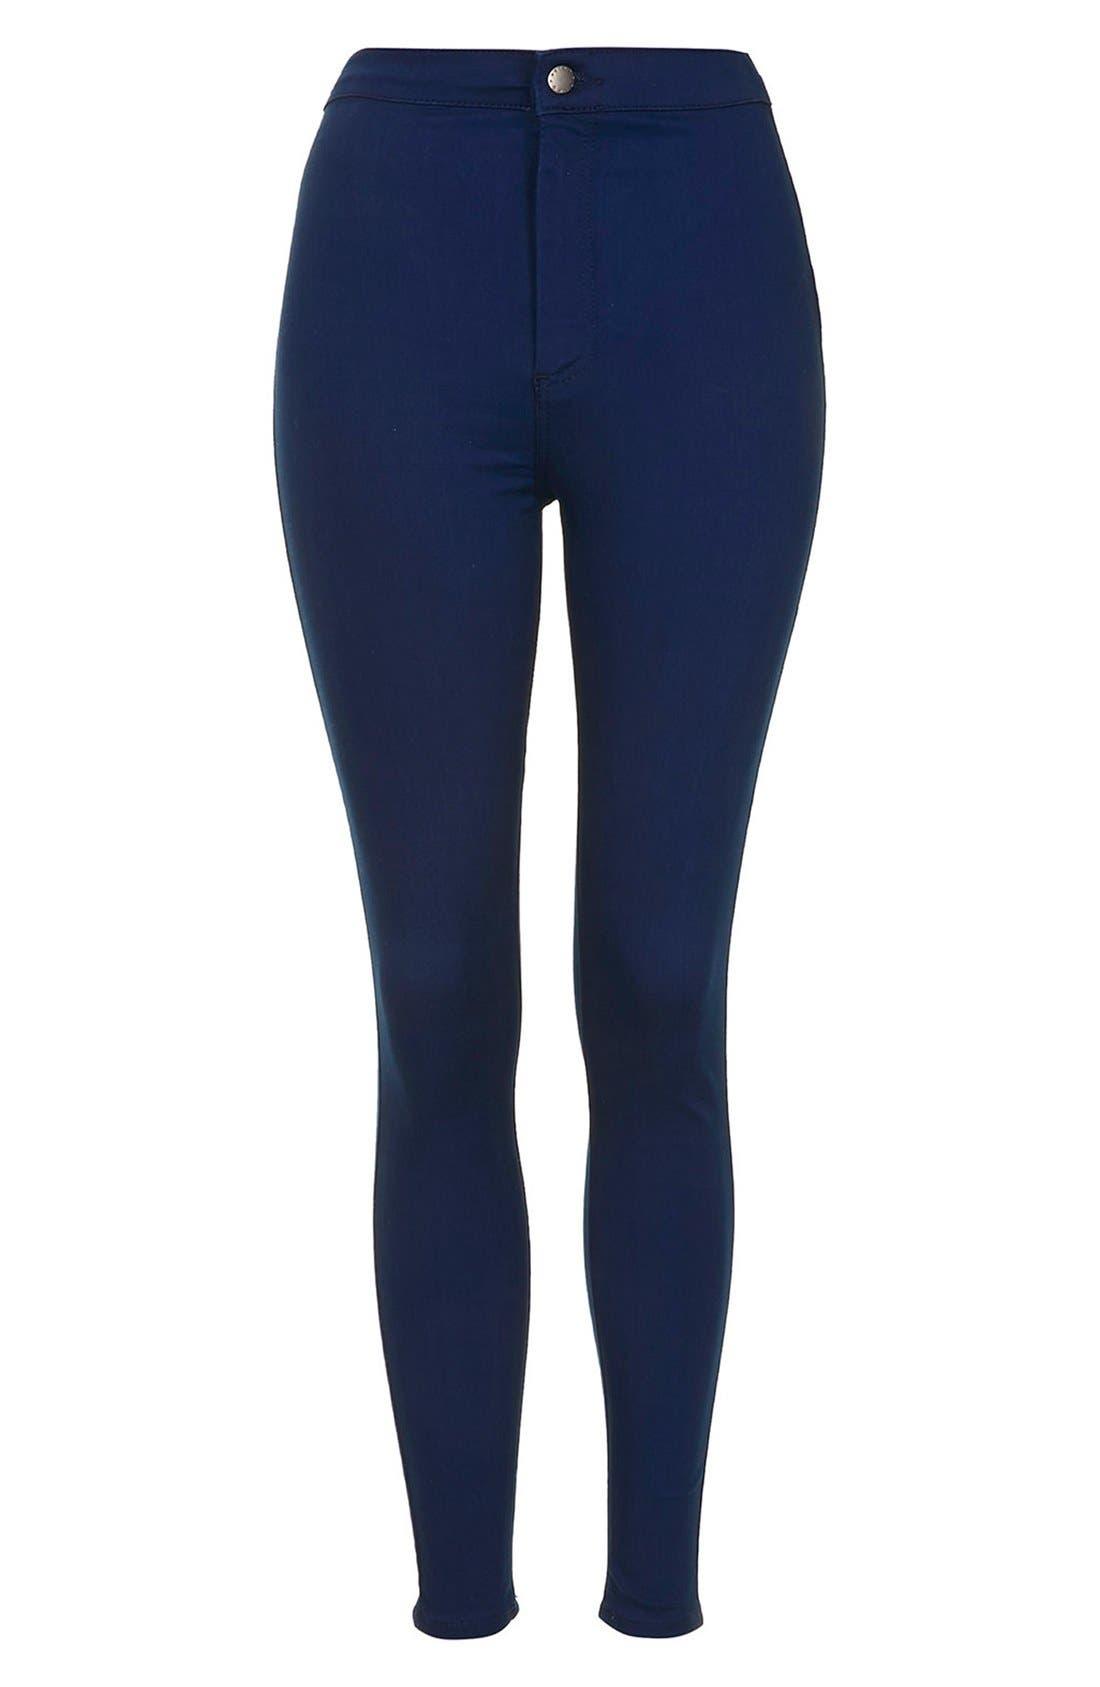 Alternate Image 3  - Topshop Moto 'Joni' High Rise Skinny Jeans (Bright Blue)